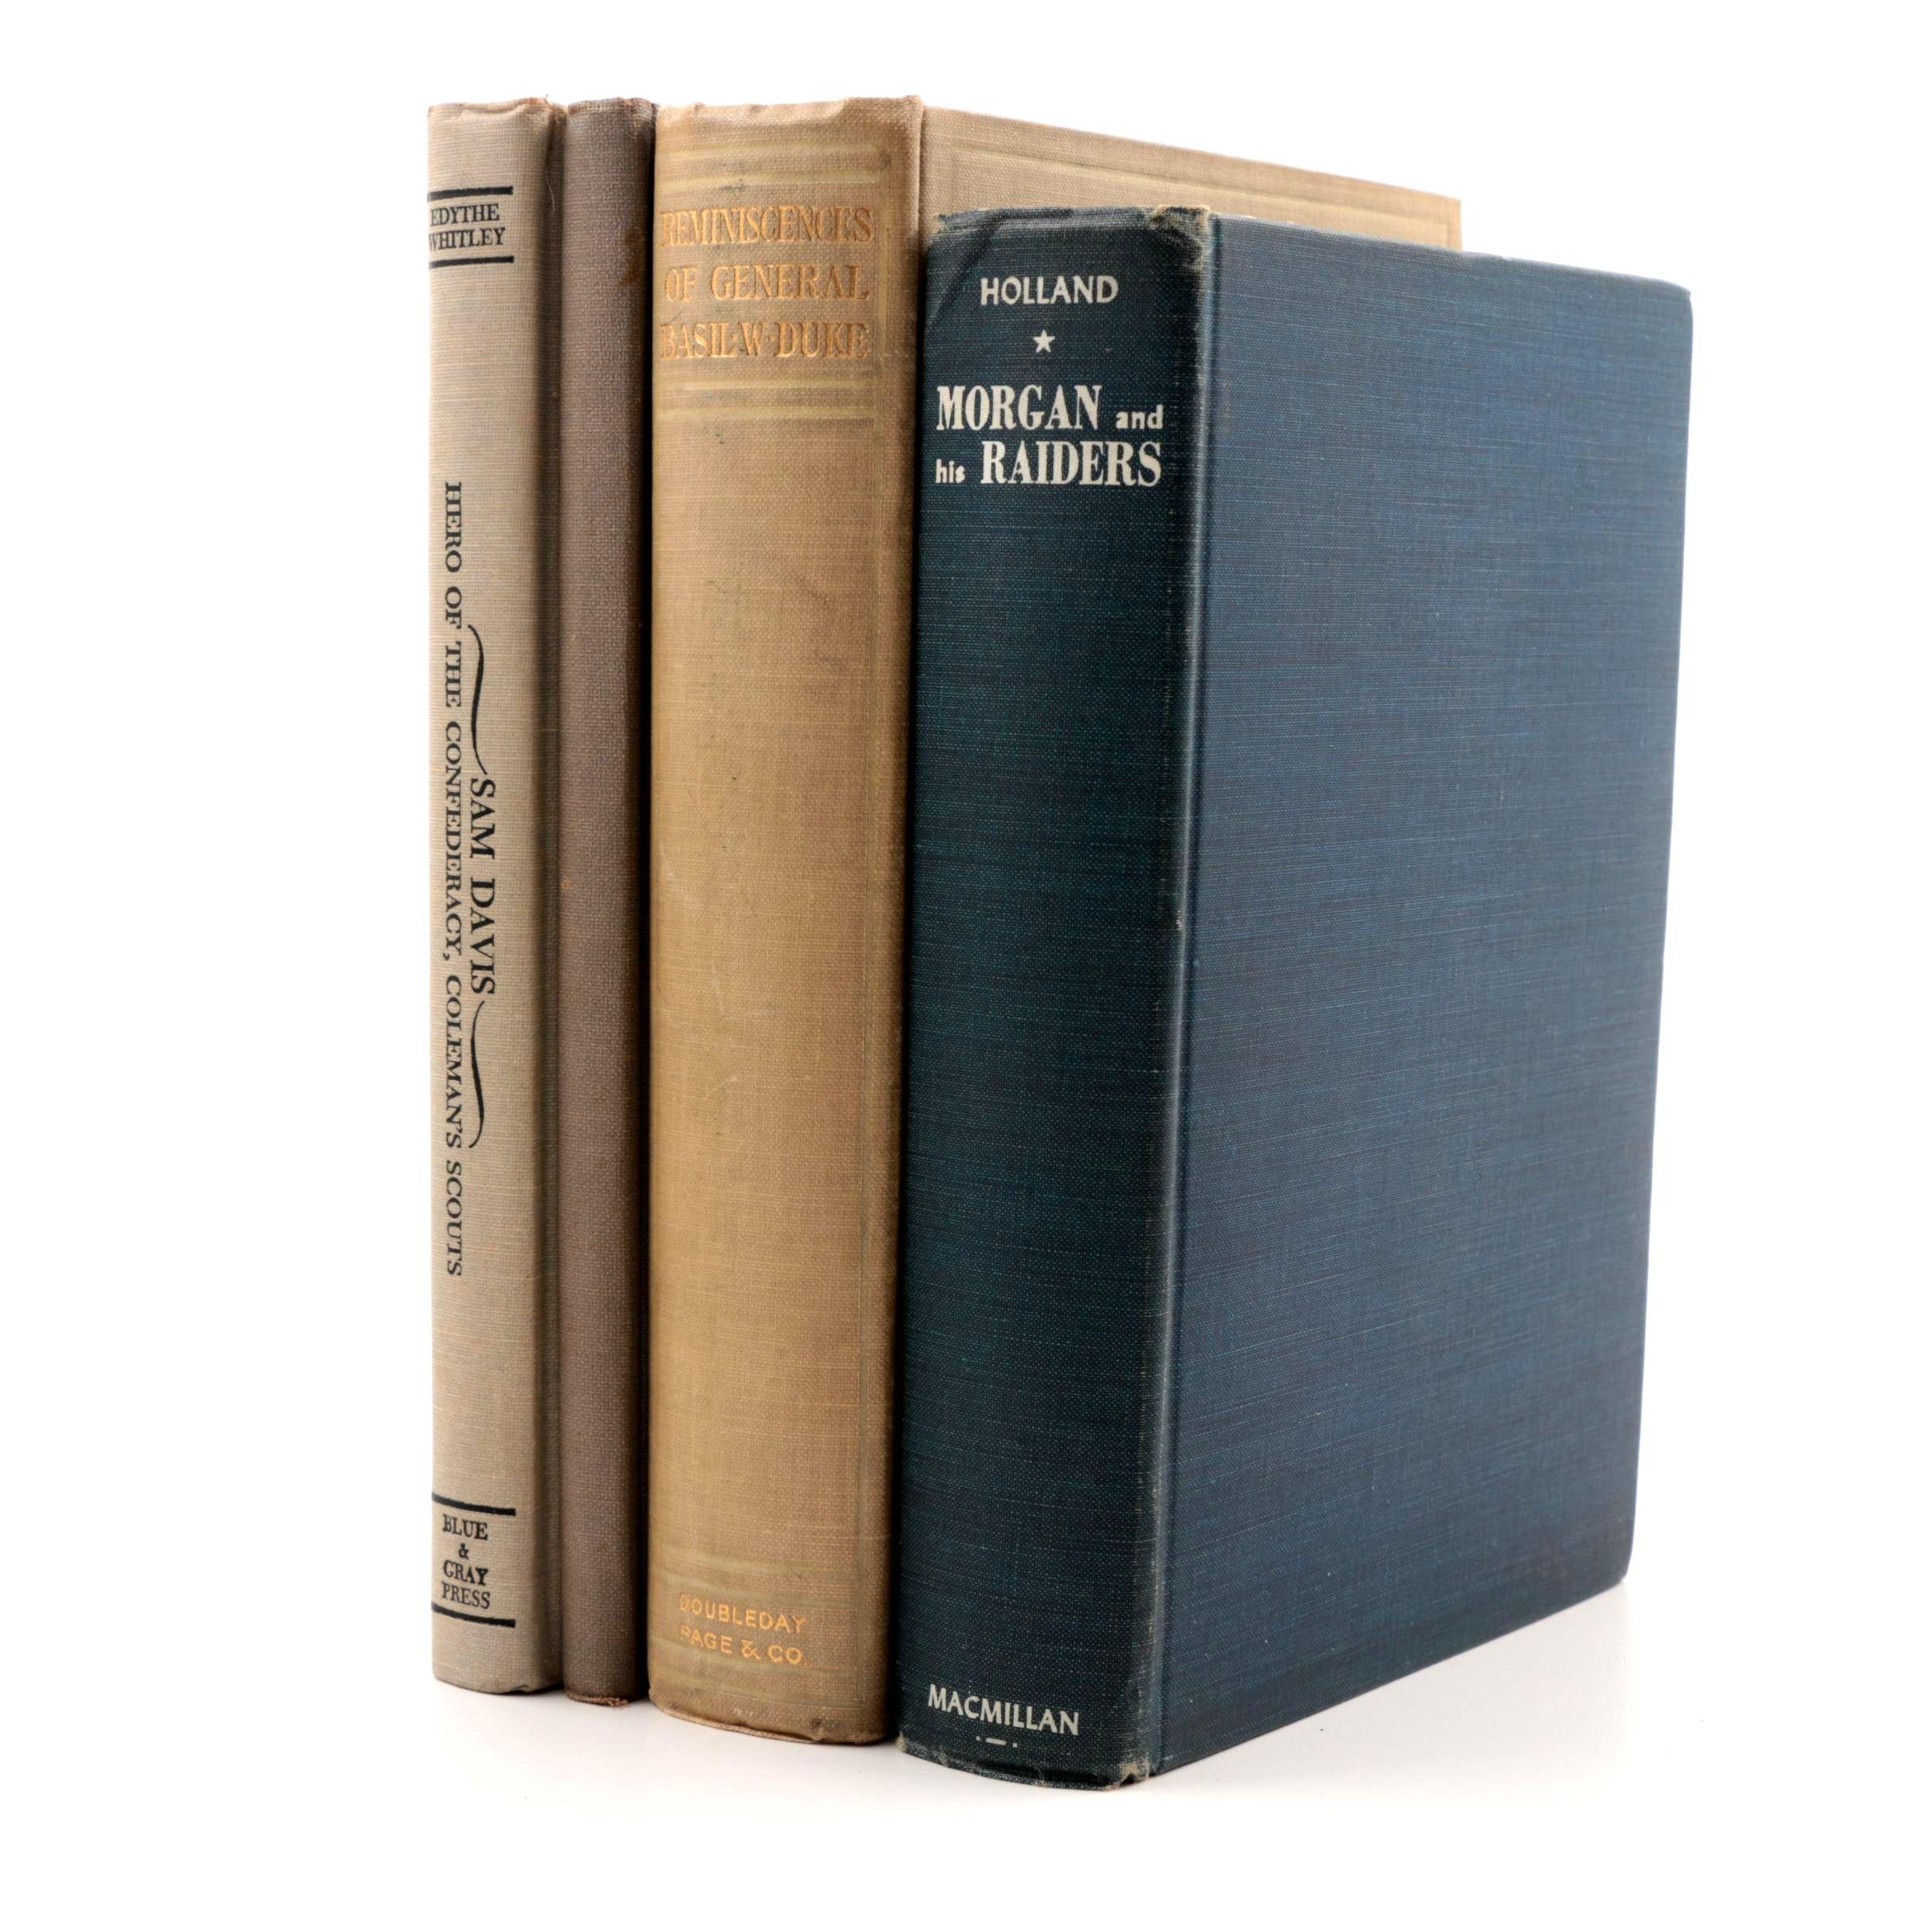 Books on Confederate Generals of the American Civil War